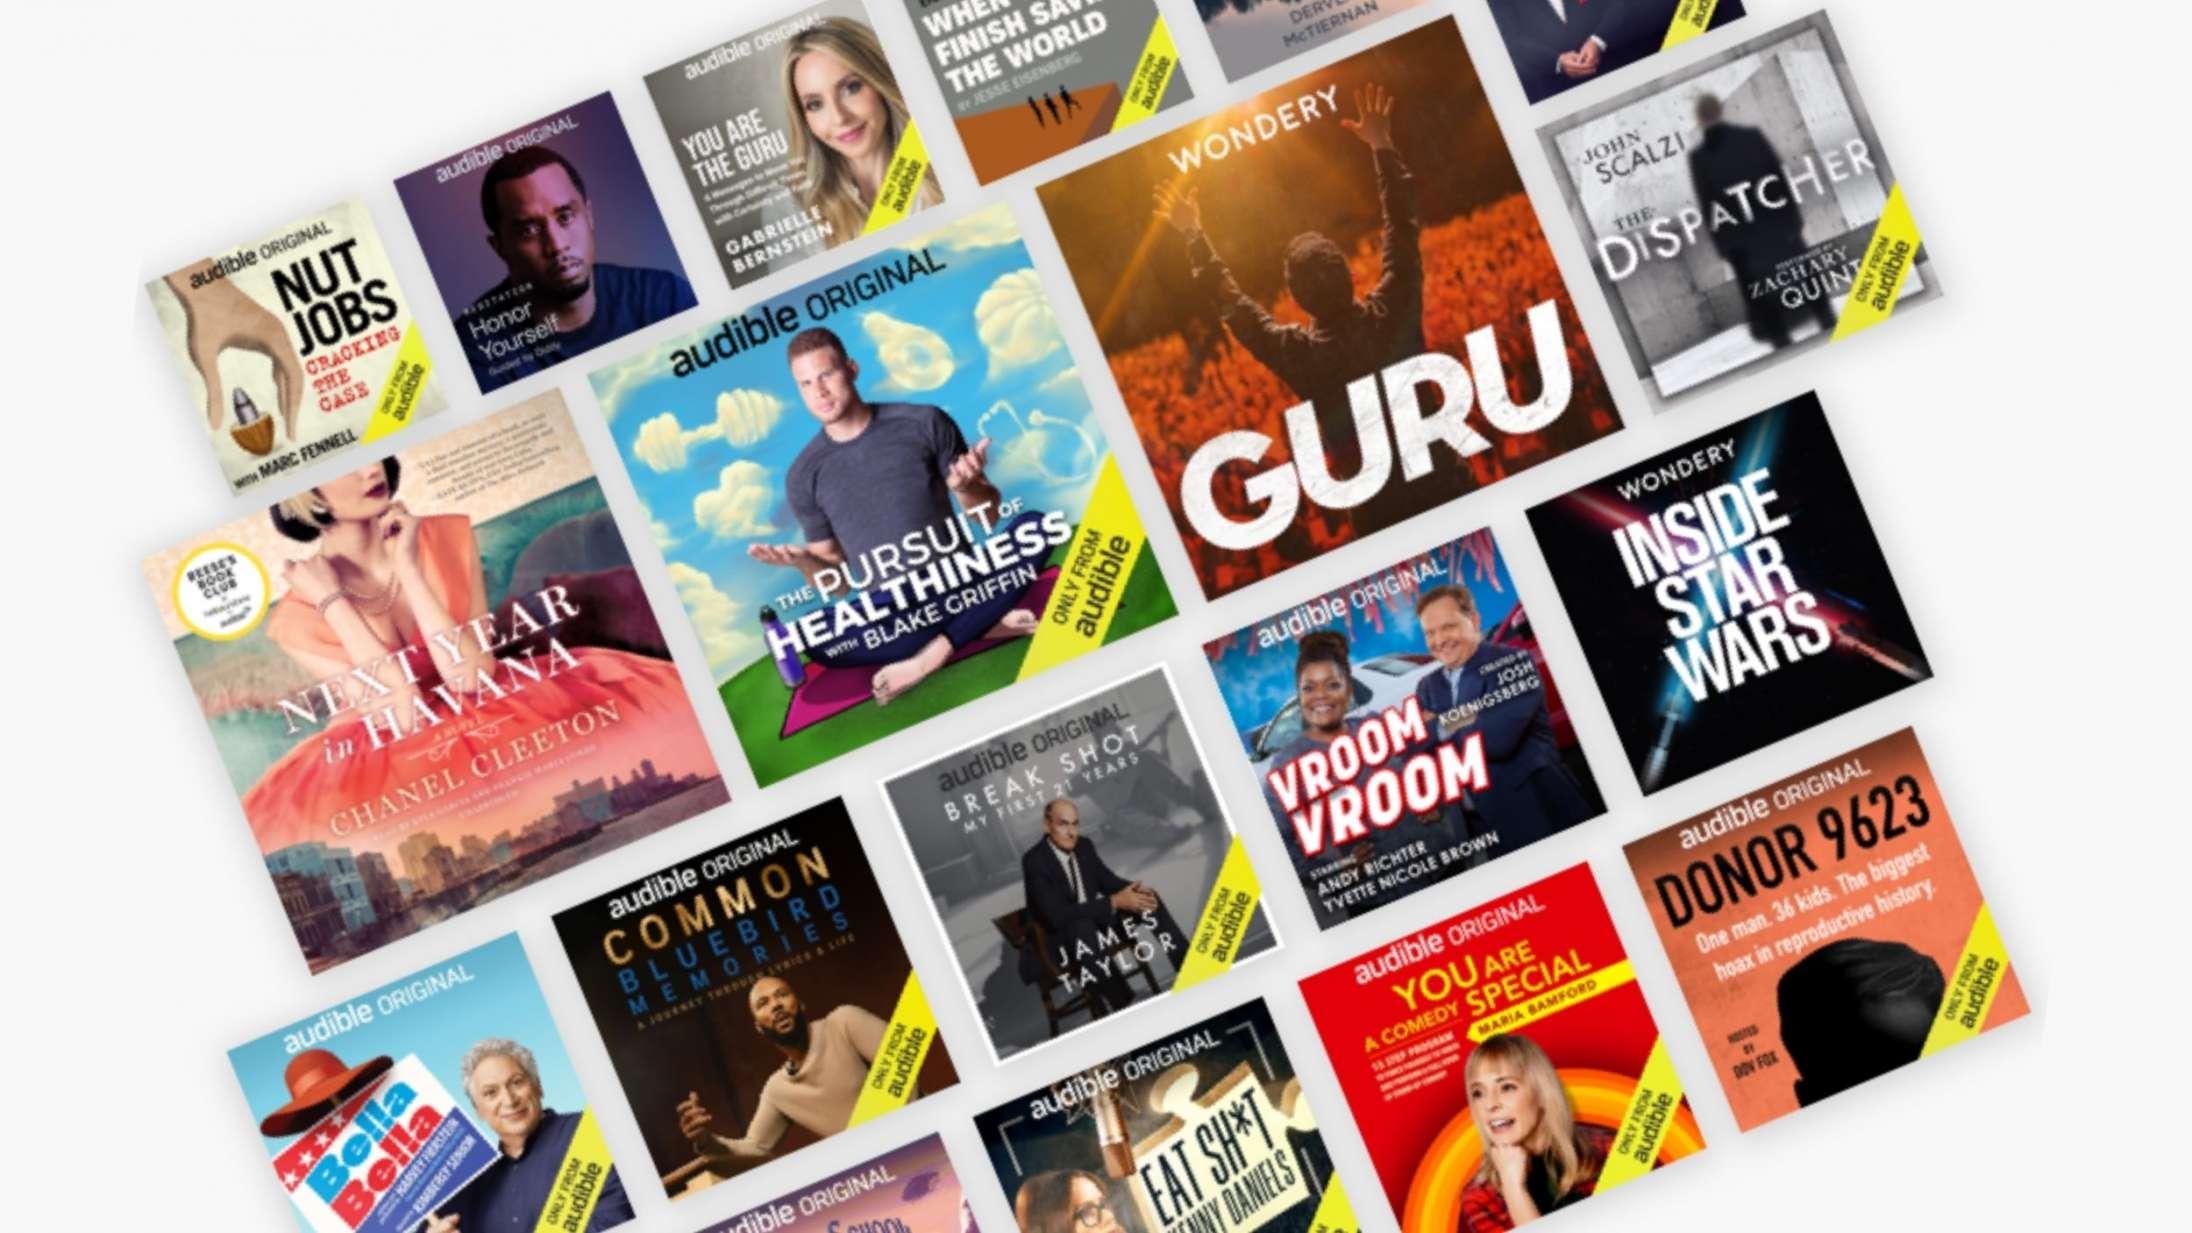 Amazon tager podcast-kampen op mod Spotify og Apple